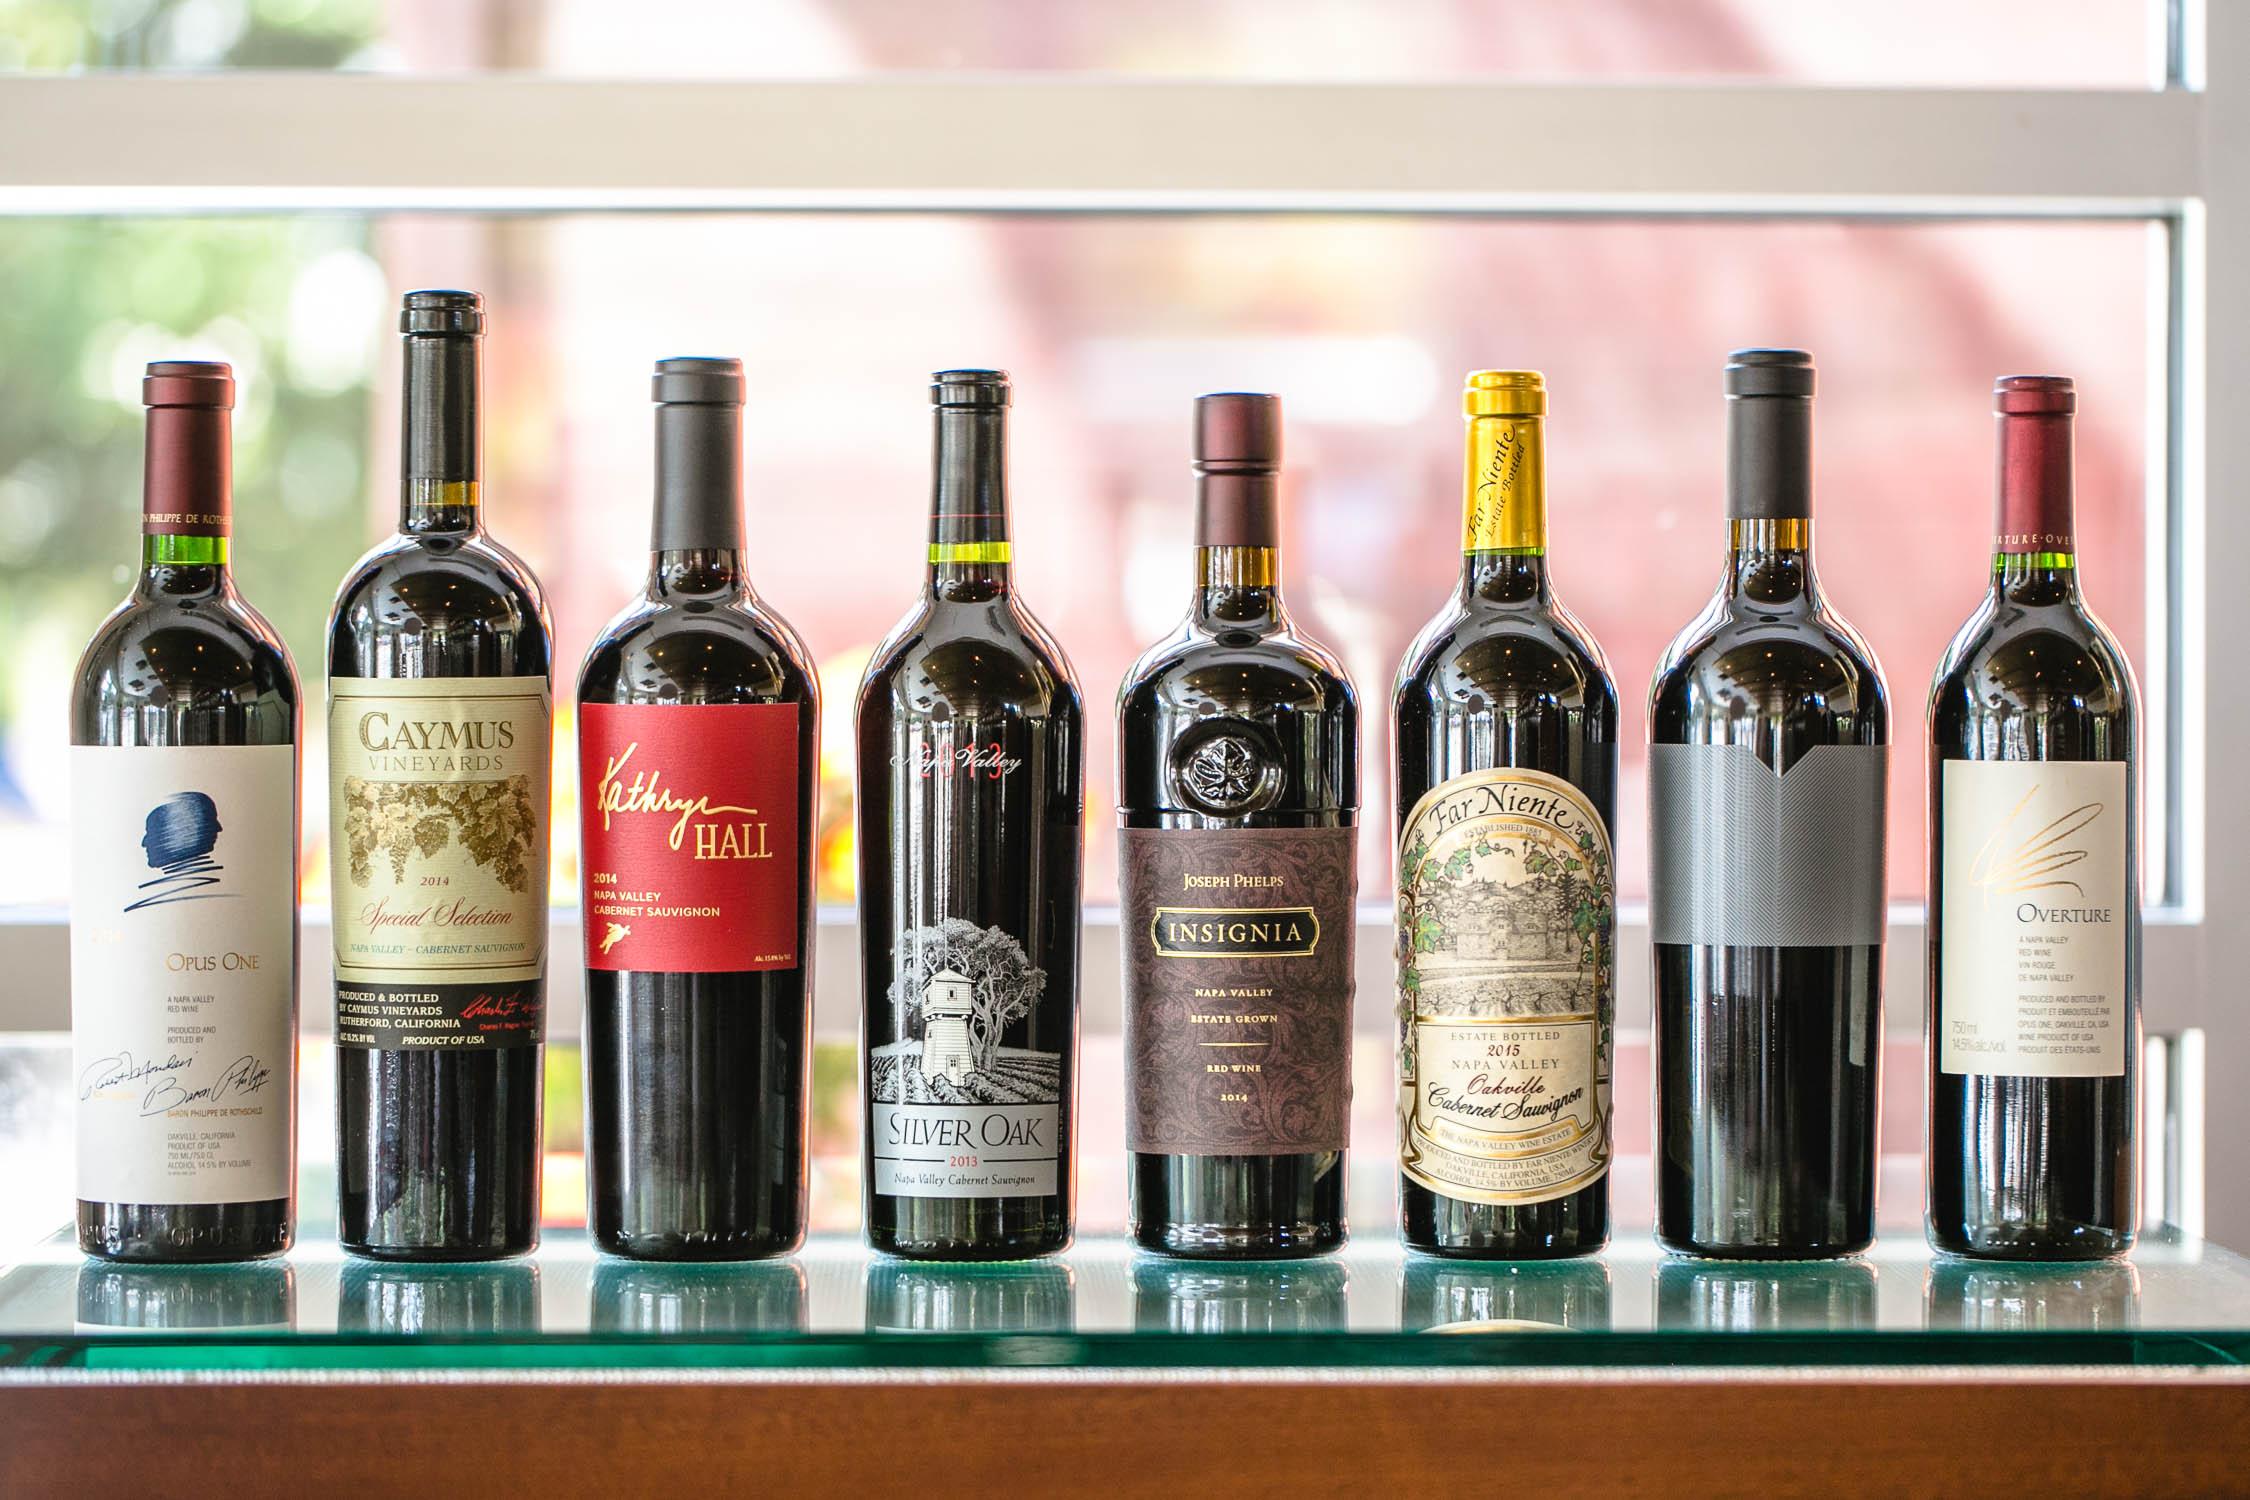 Nan-Thai-Fine-Dining-Private-Cellar-Wines-Erik-Meadows